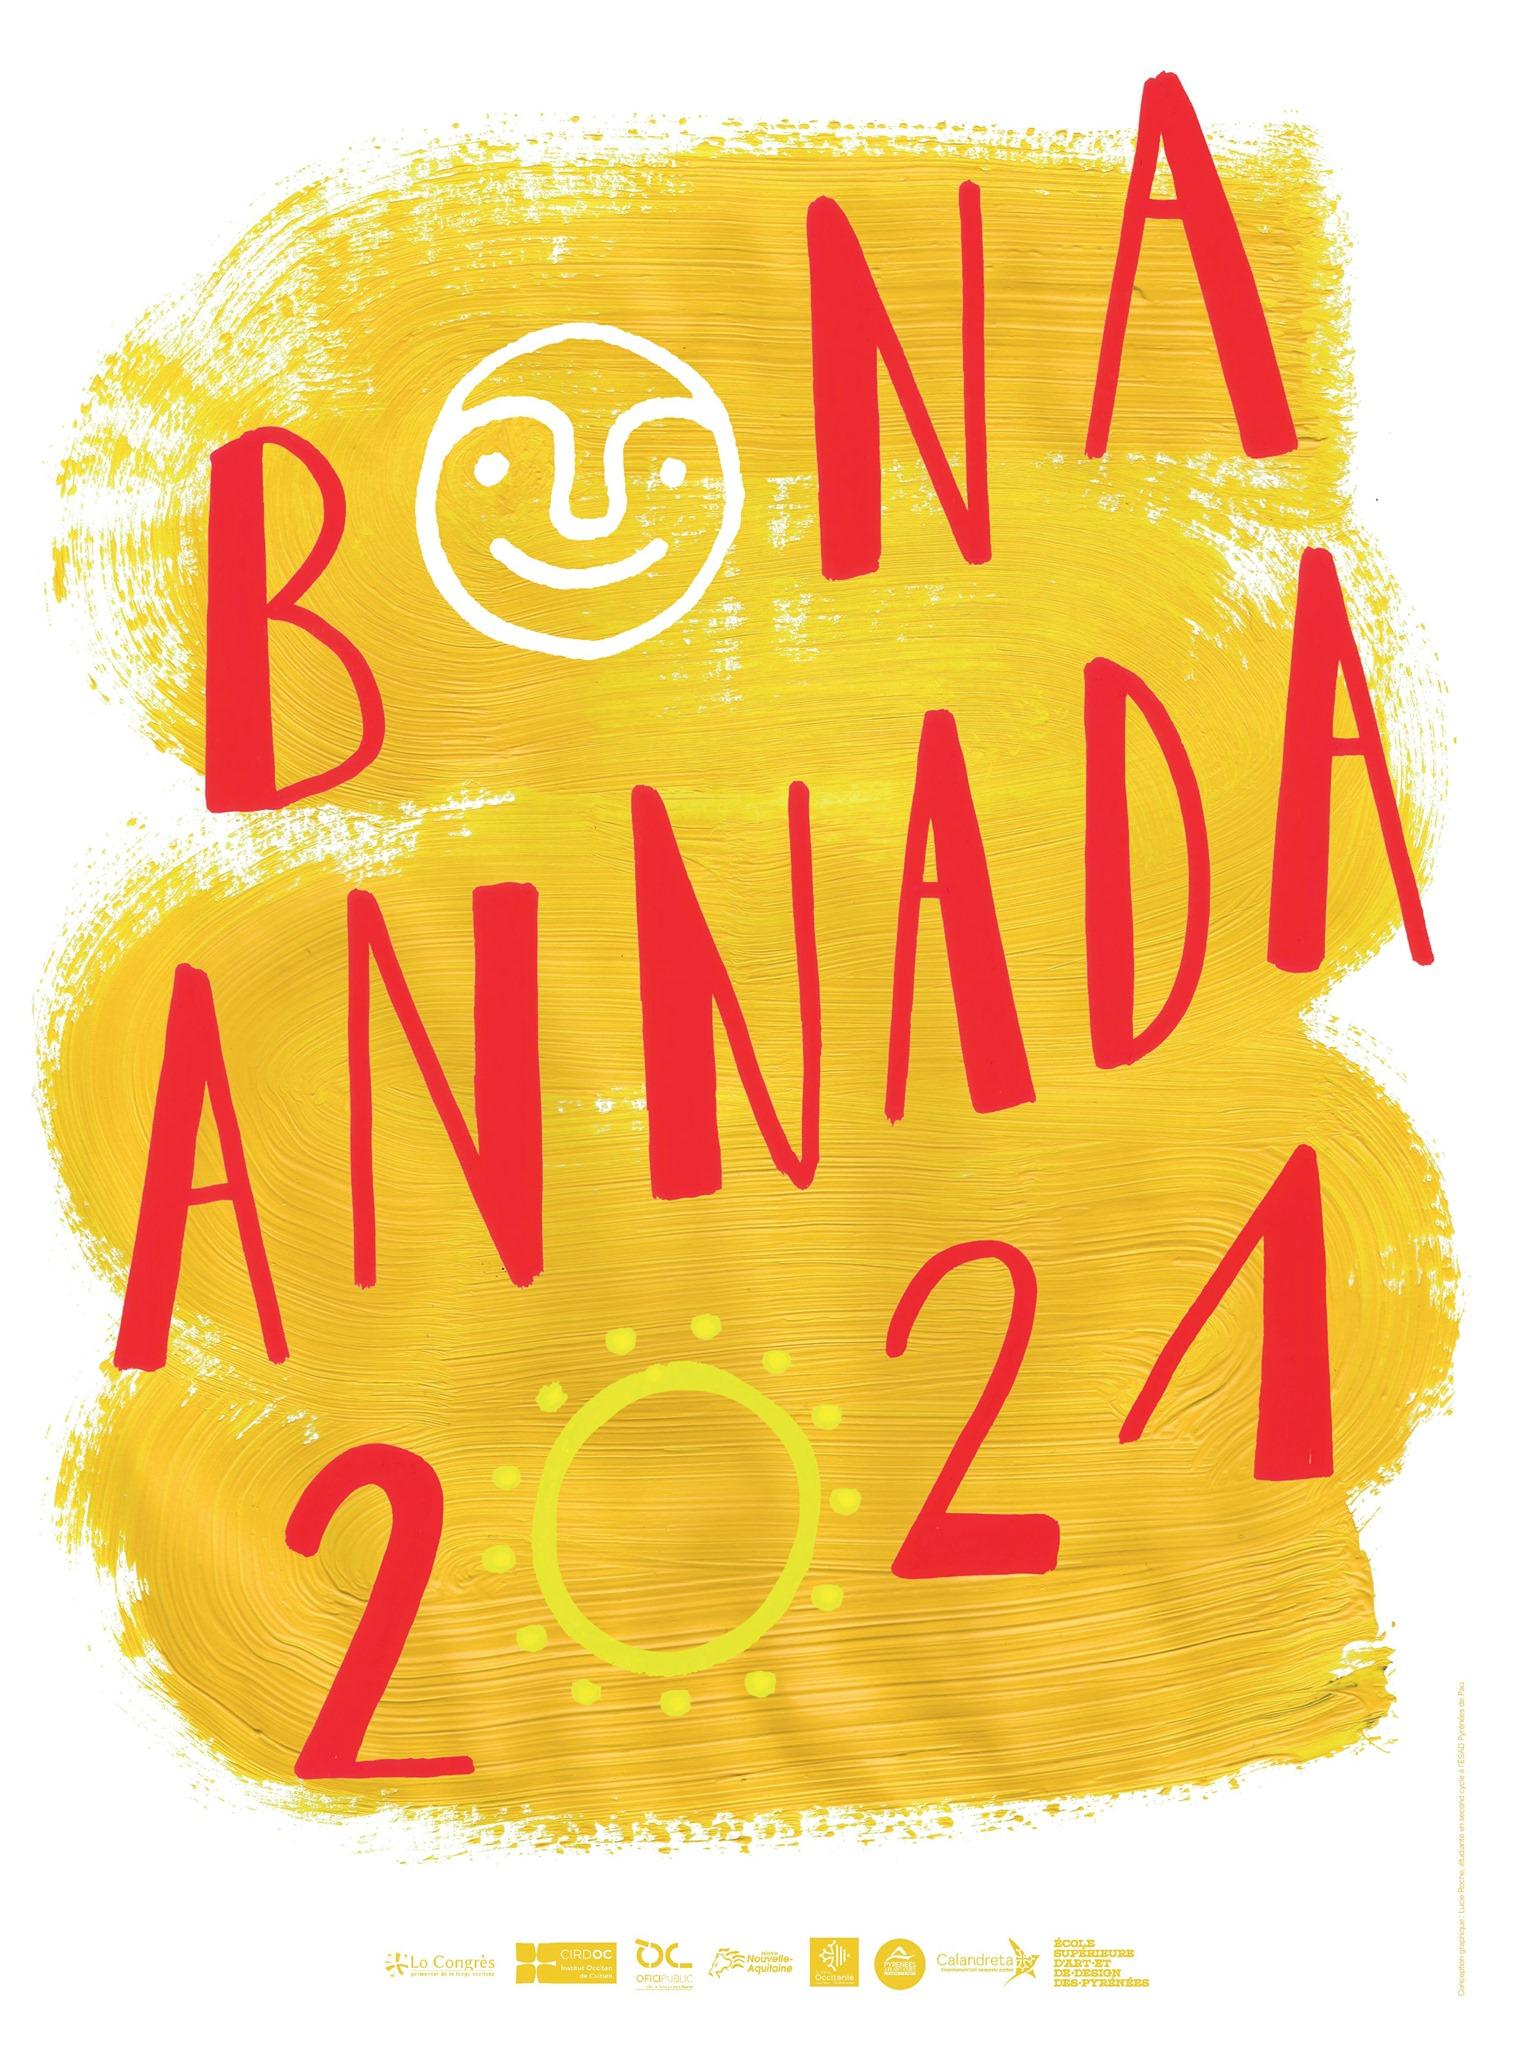 affiche-bona-annada-2021.jpg